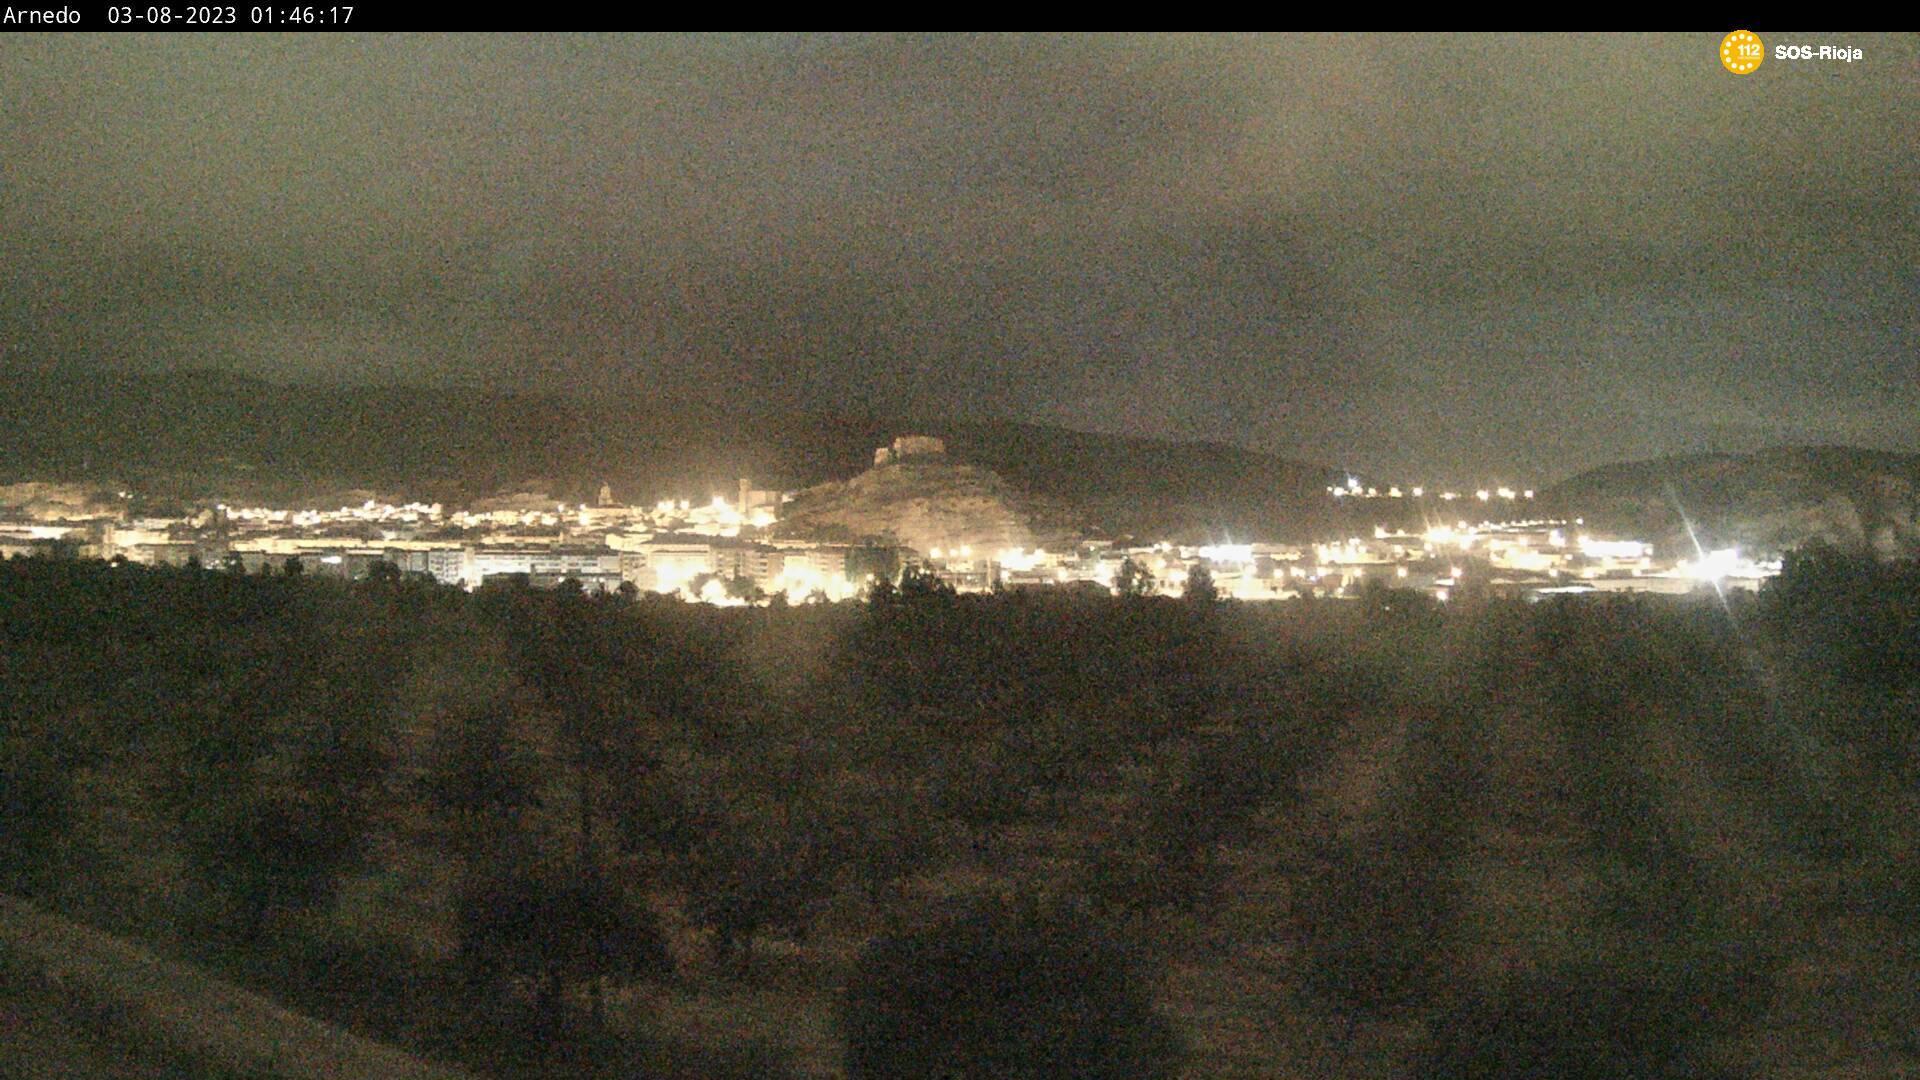 Webcam Arnedo